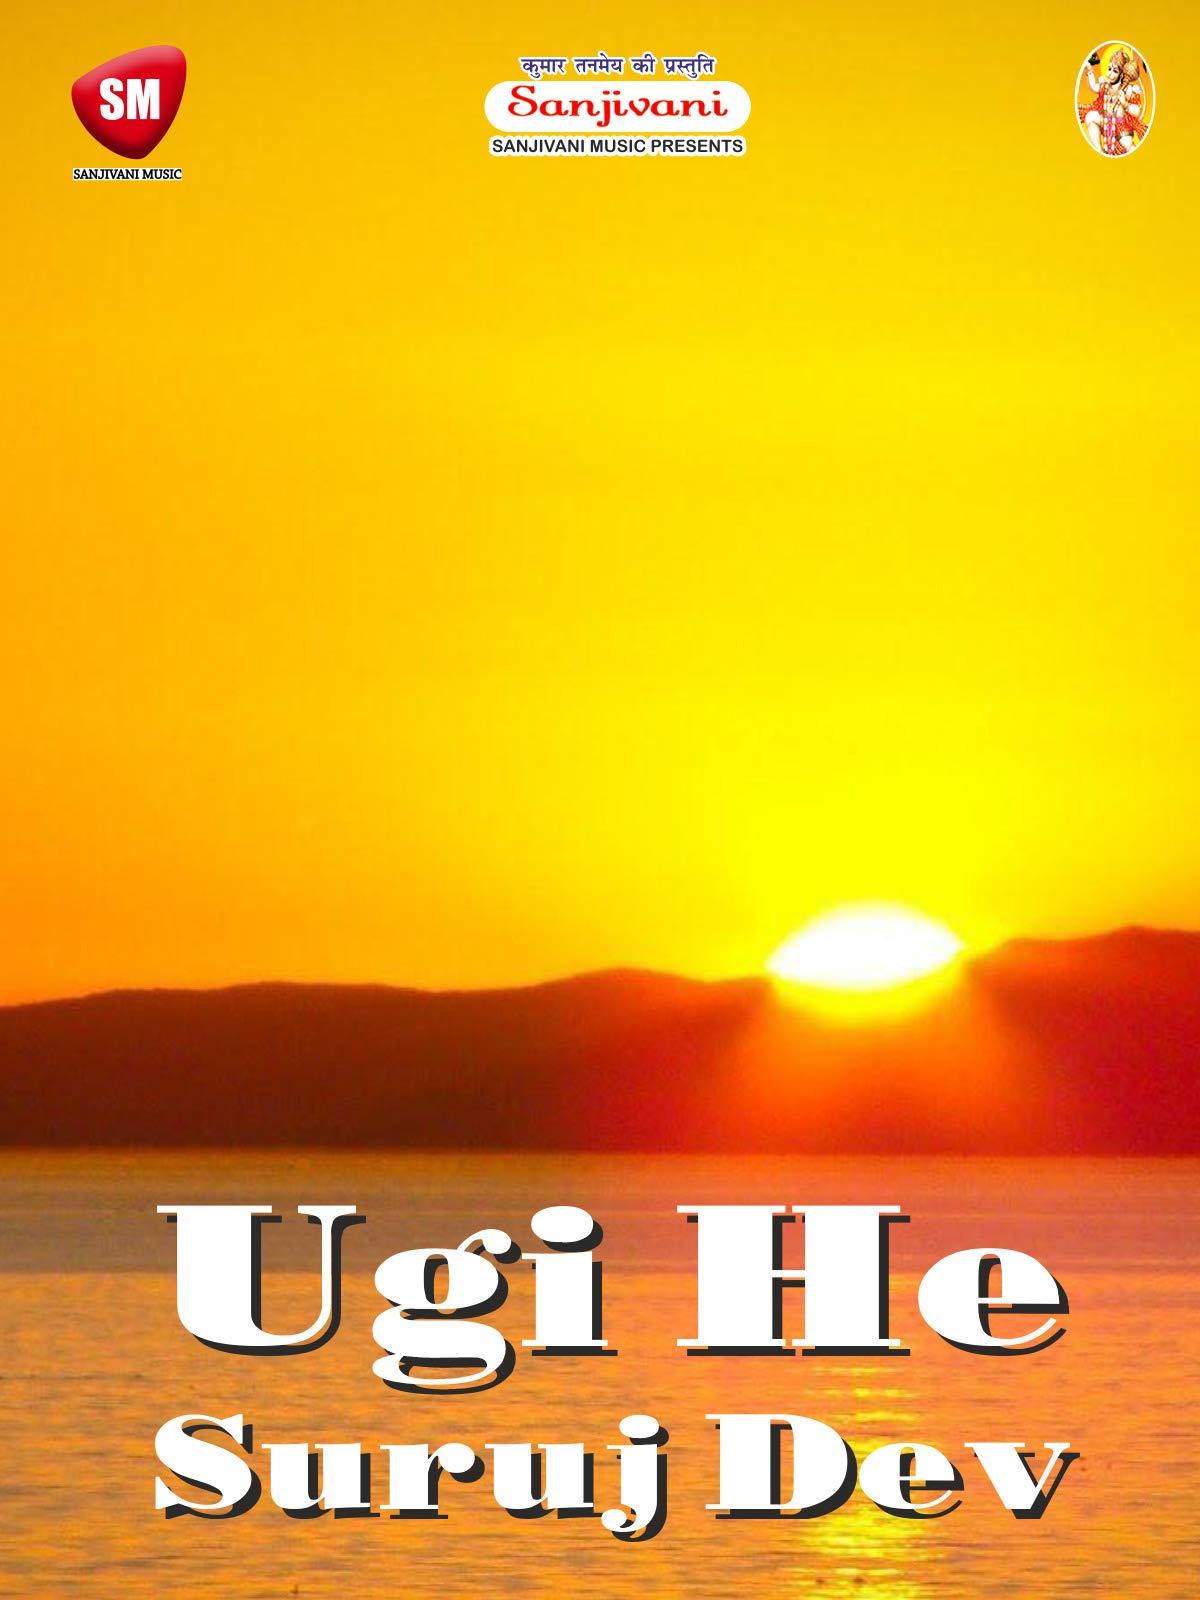 Ugi He Suruj Dev on Amazon Prime Video UK